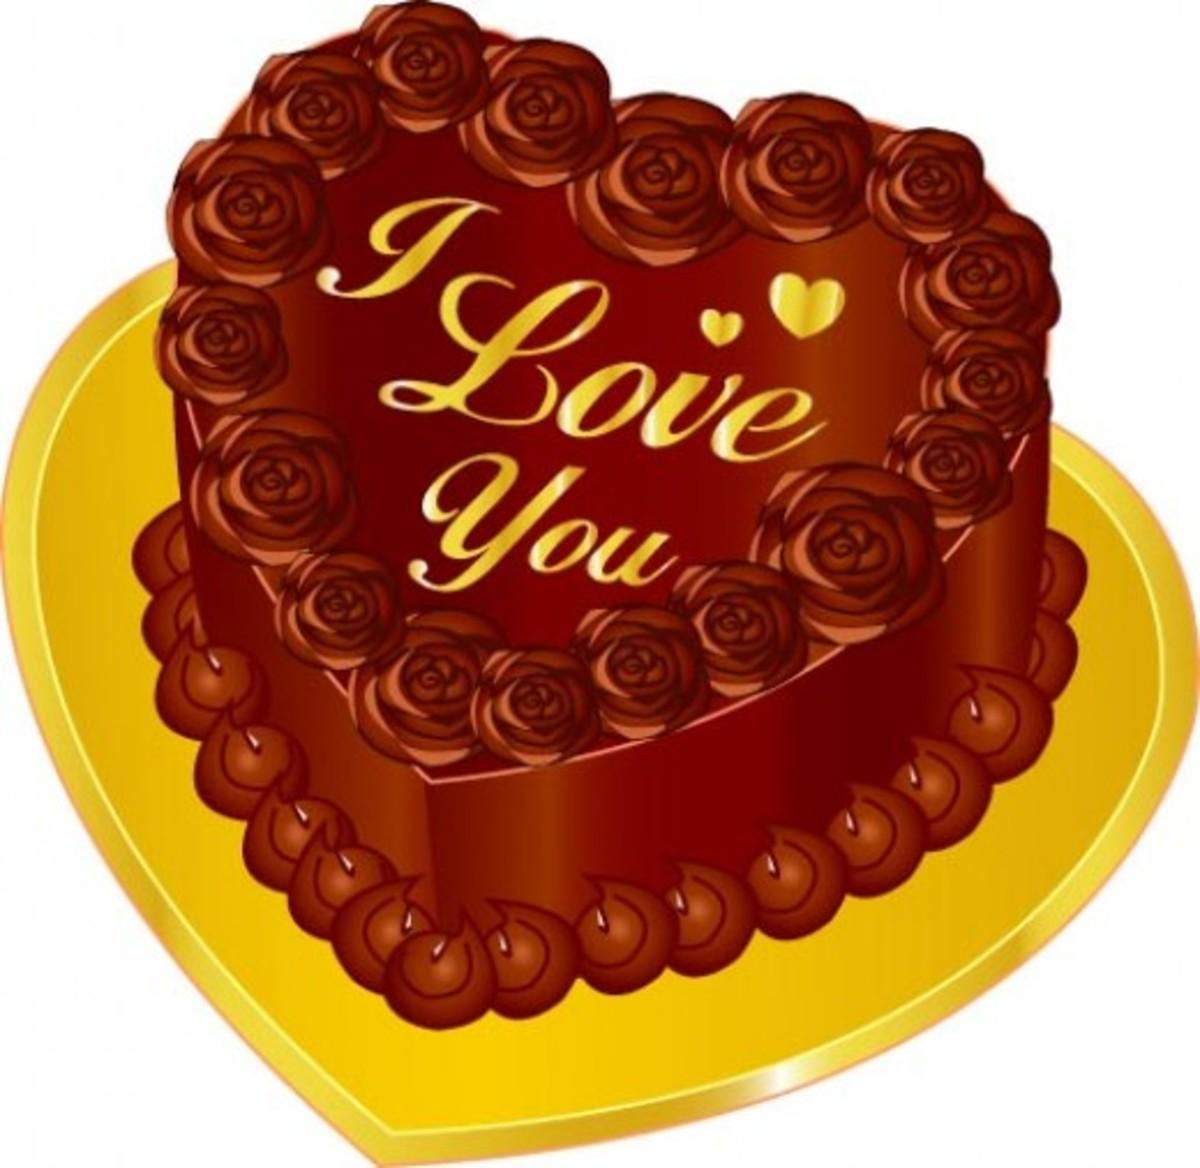 I Love You Heart-Shaped Valentine Chocolate Cake